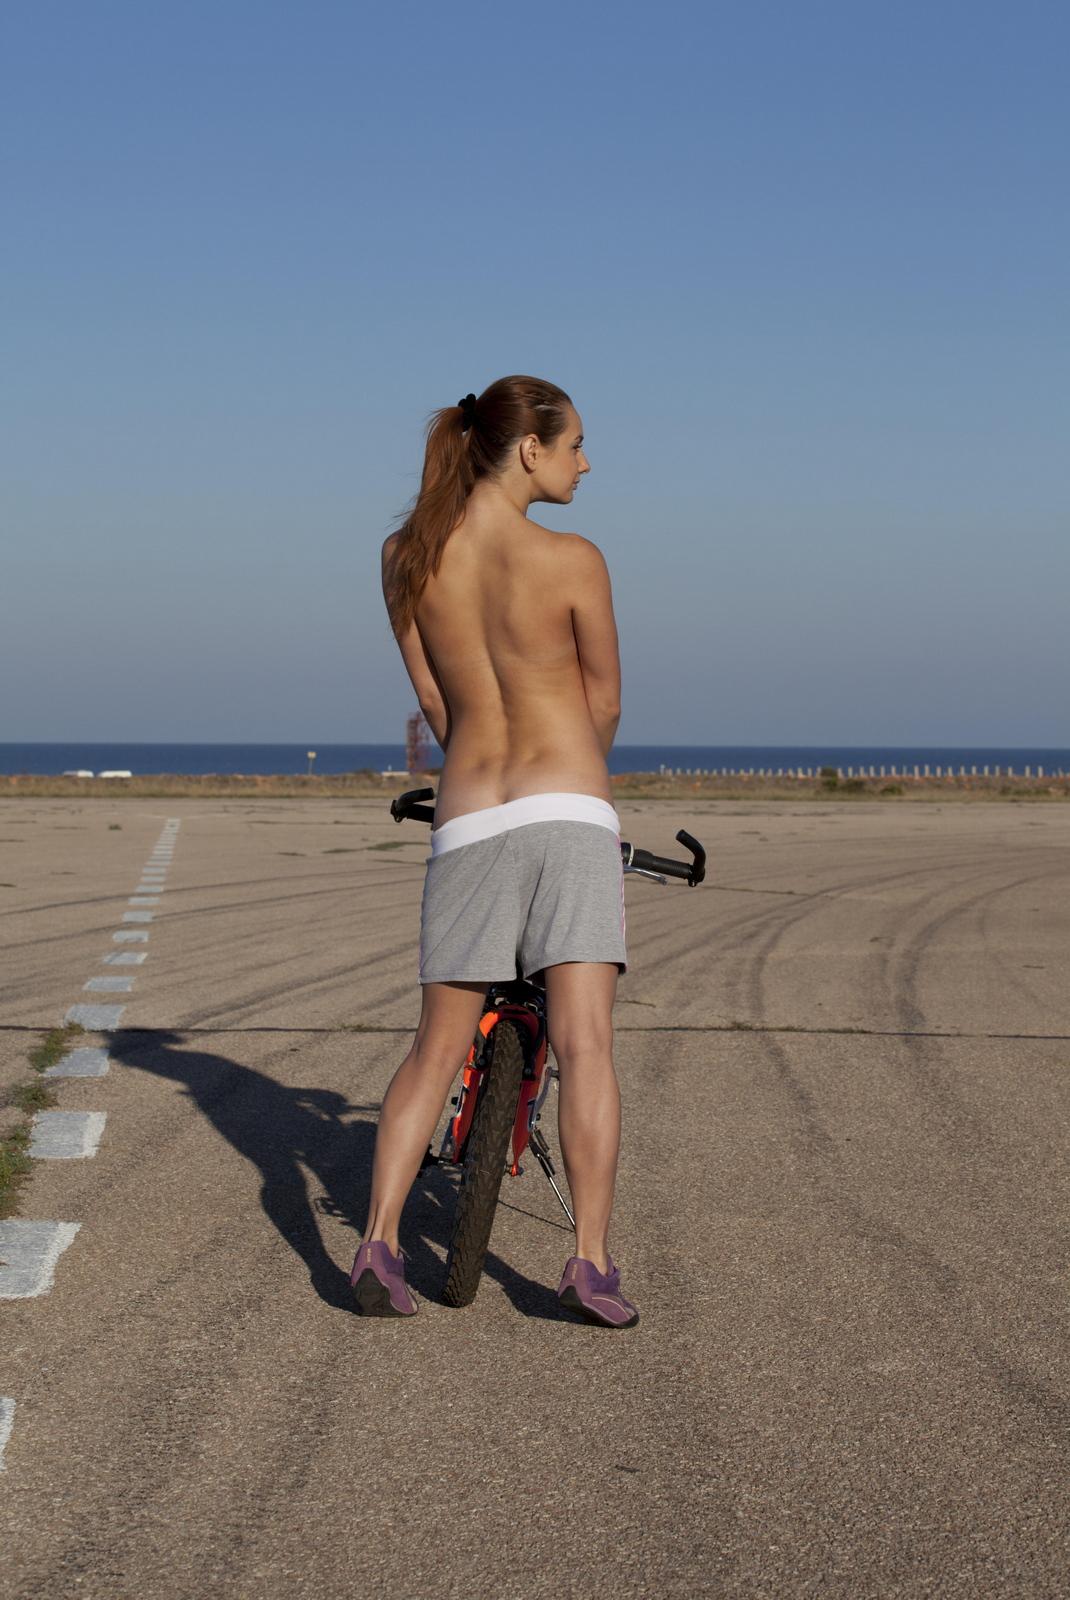 mishel-c-bicycle-boobs-naked-domai-08